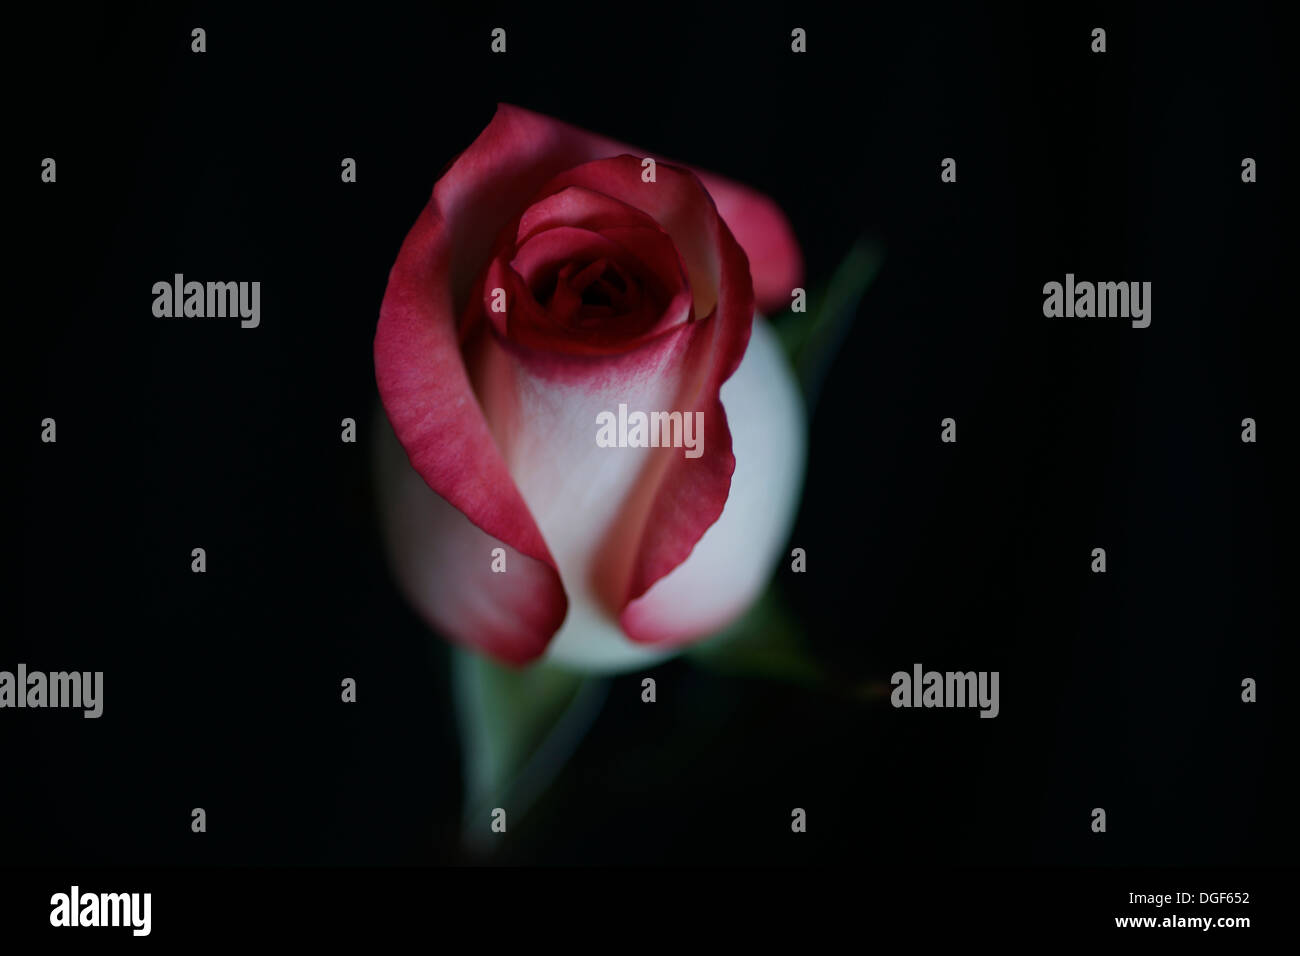 Macro shot of a two-tone blush rose bud against black background - Stock Image